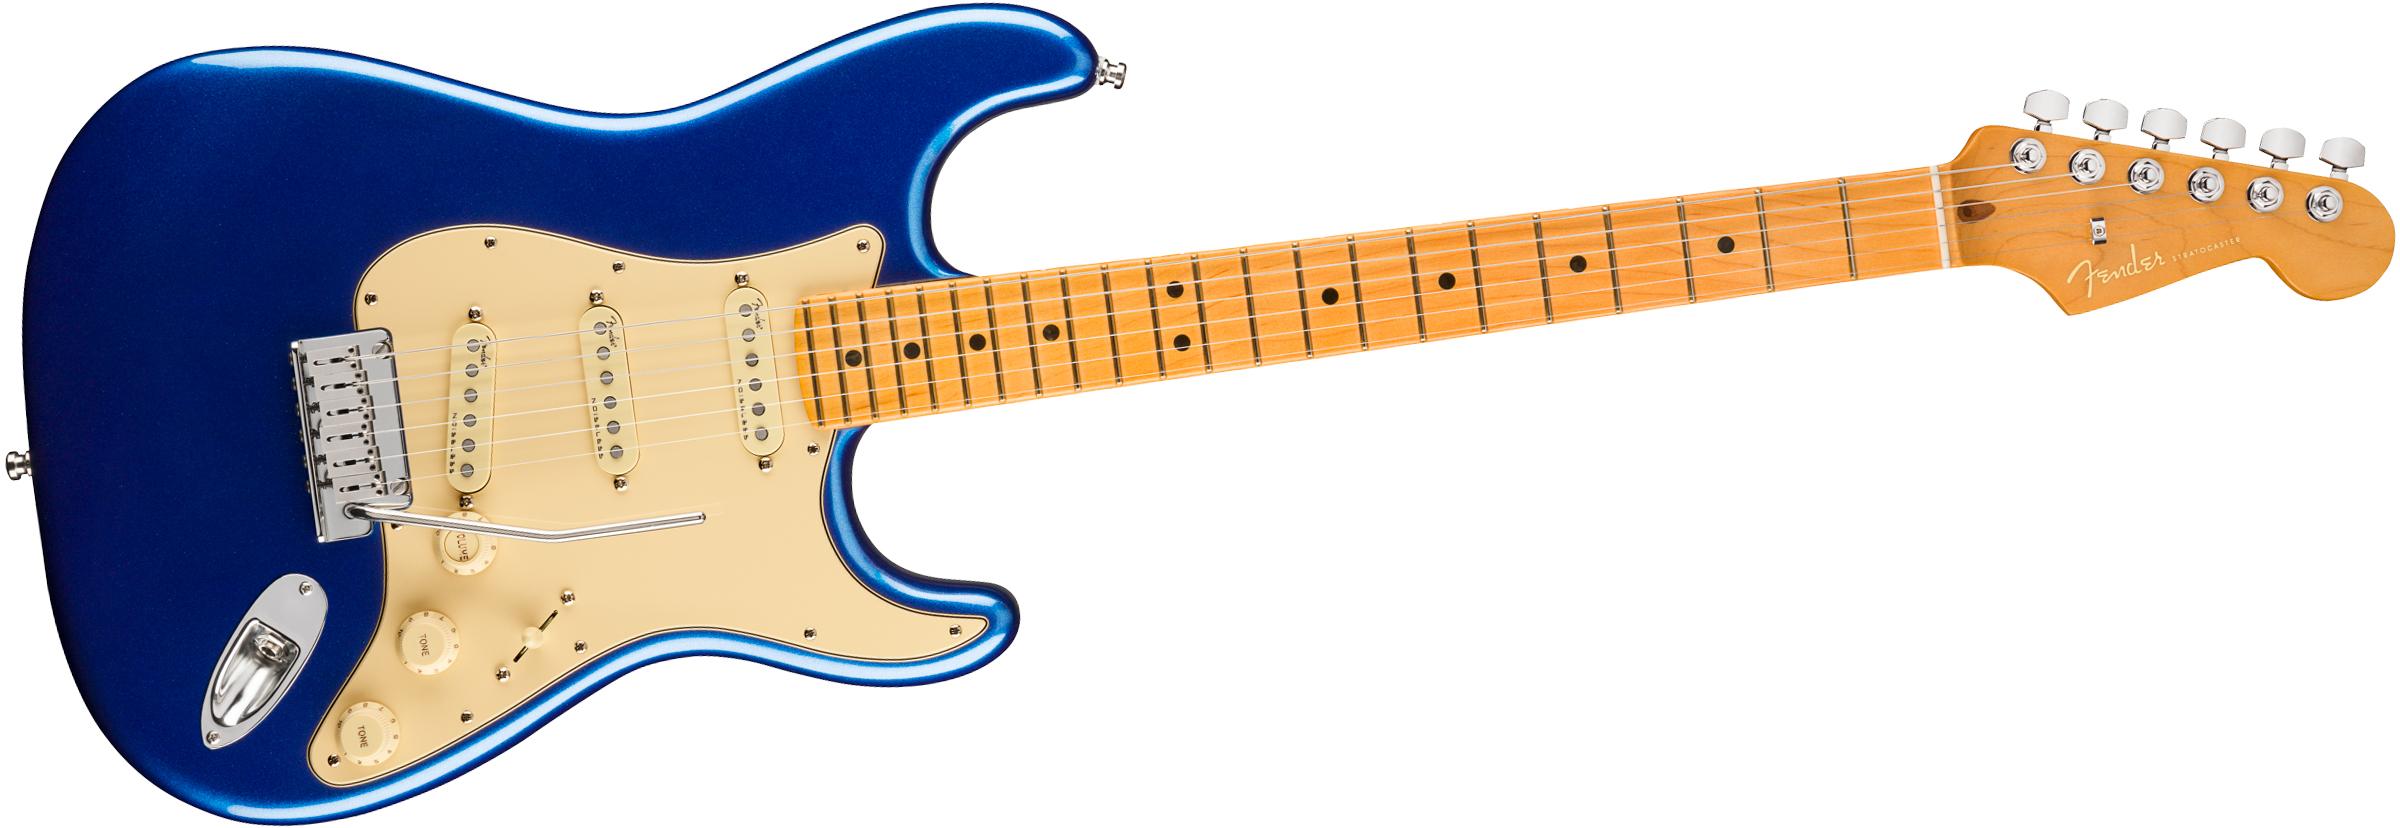 FENDER-American-Ultra-Stratocaster-MN-Cobra-Blue-0118012795-sku-23688